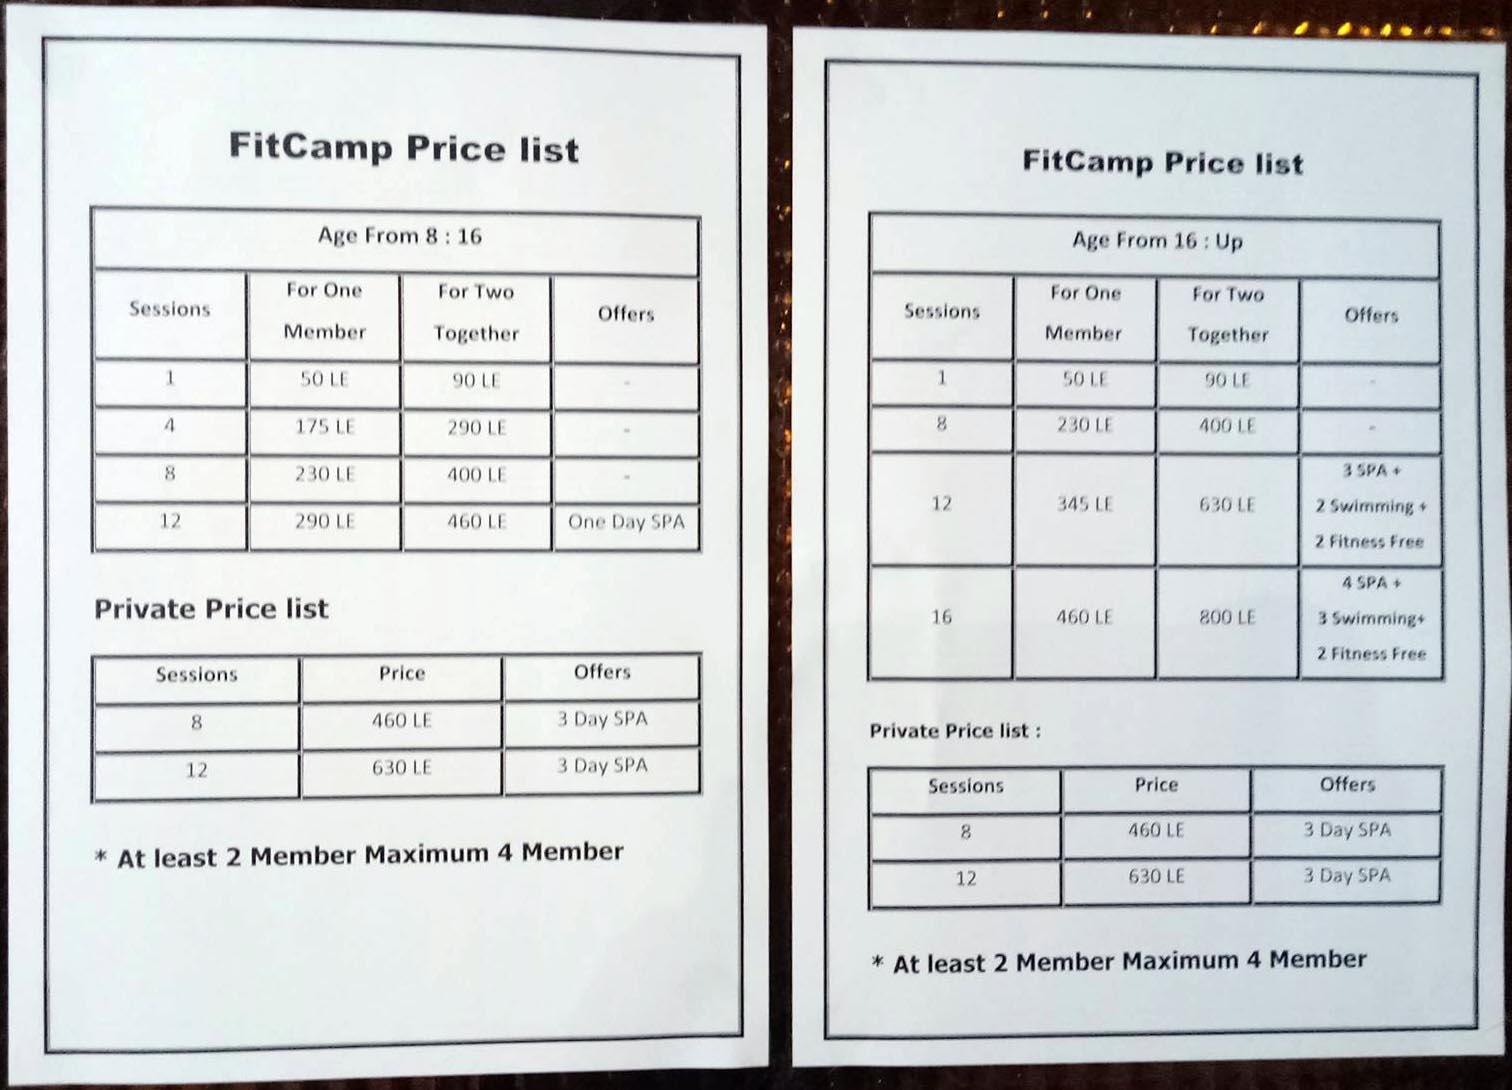 اسعار fitcamp نادى الزهور